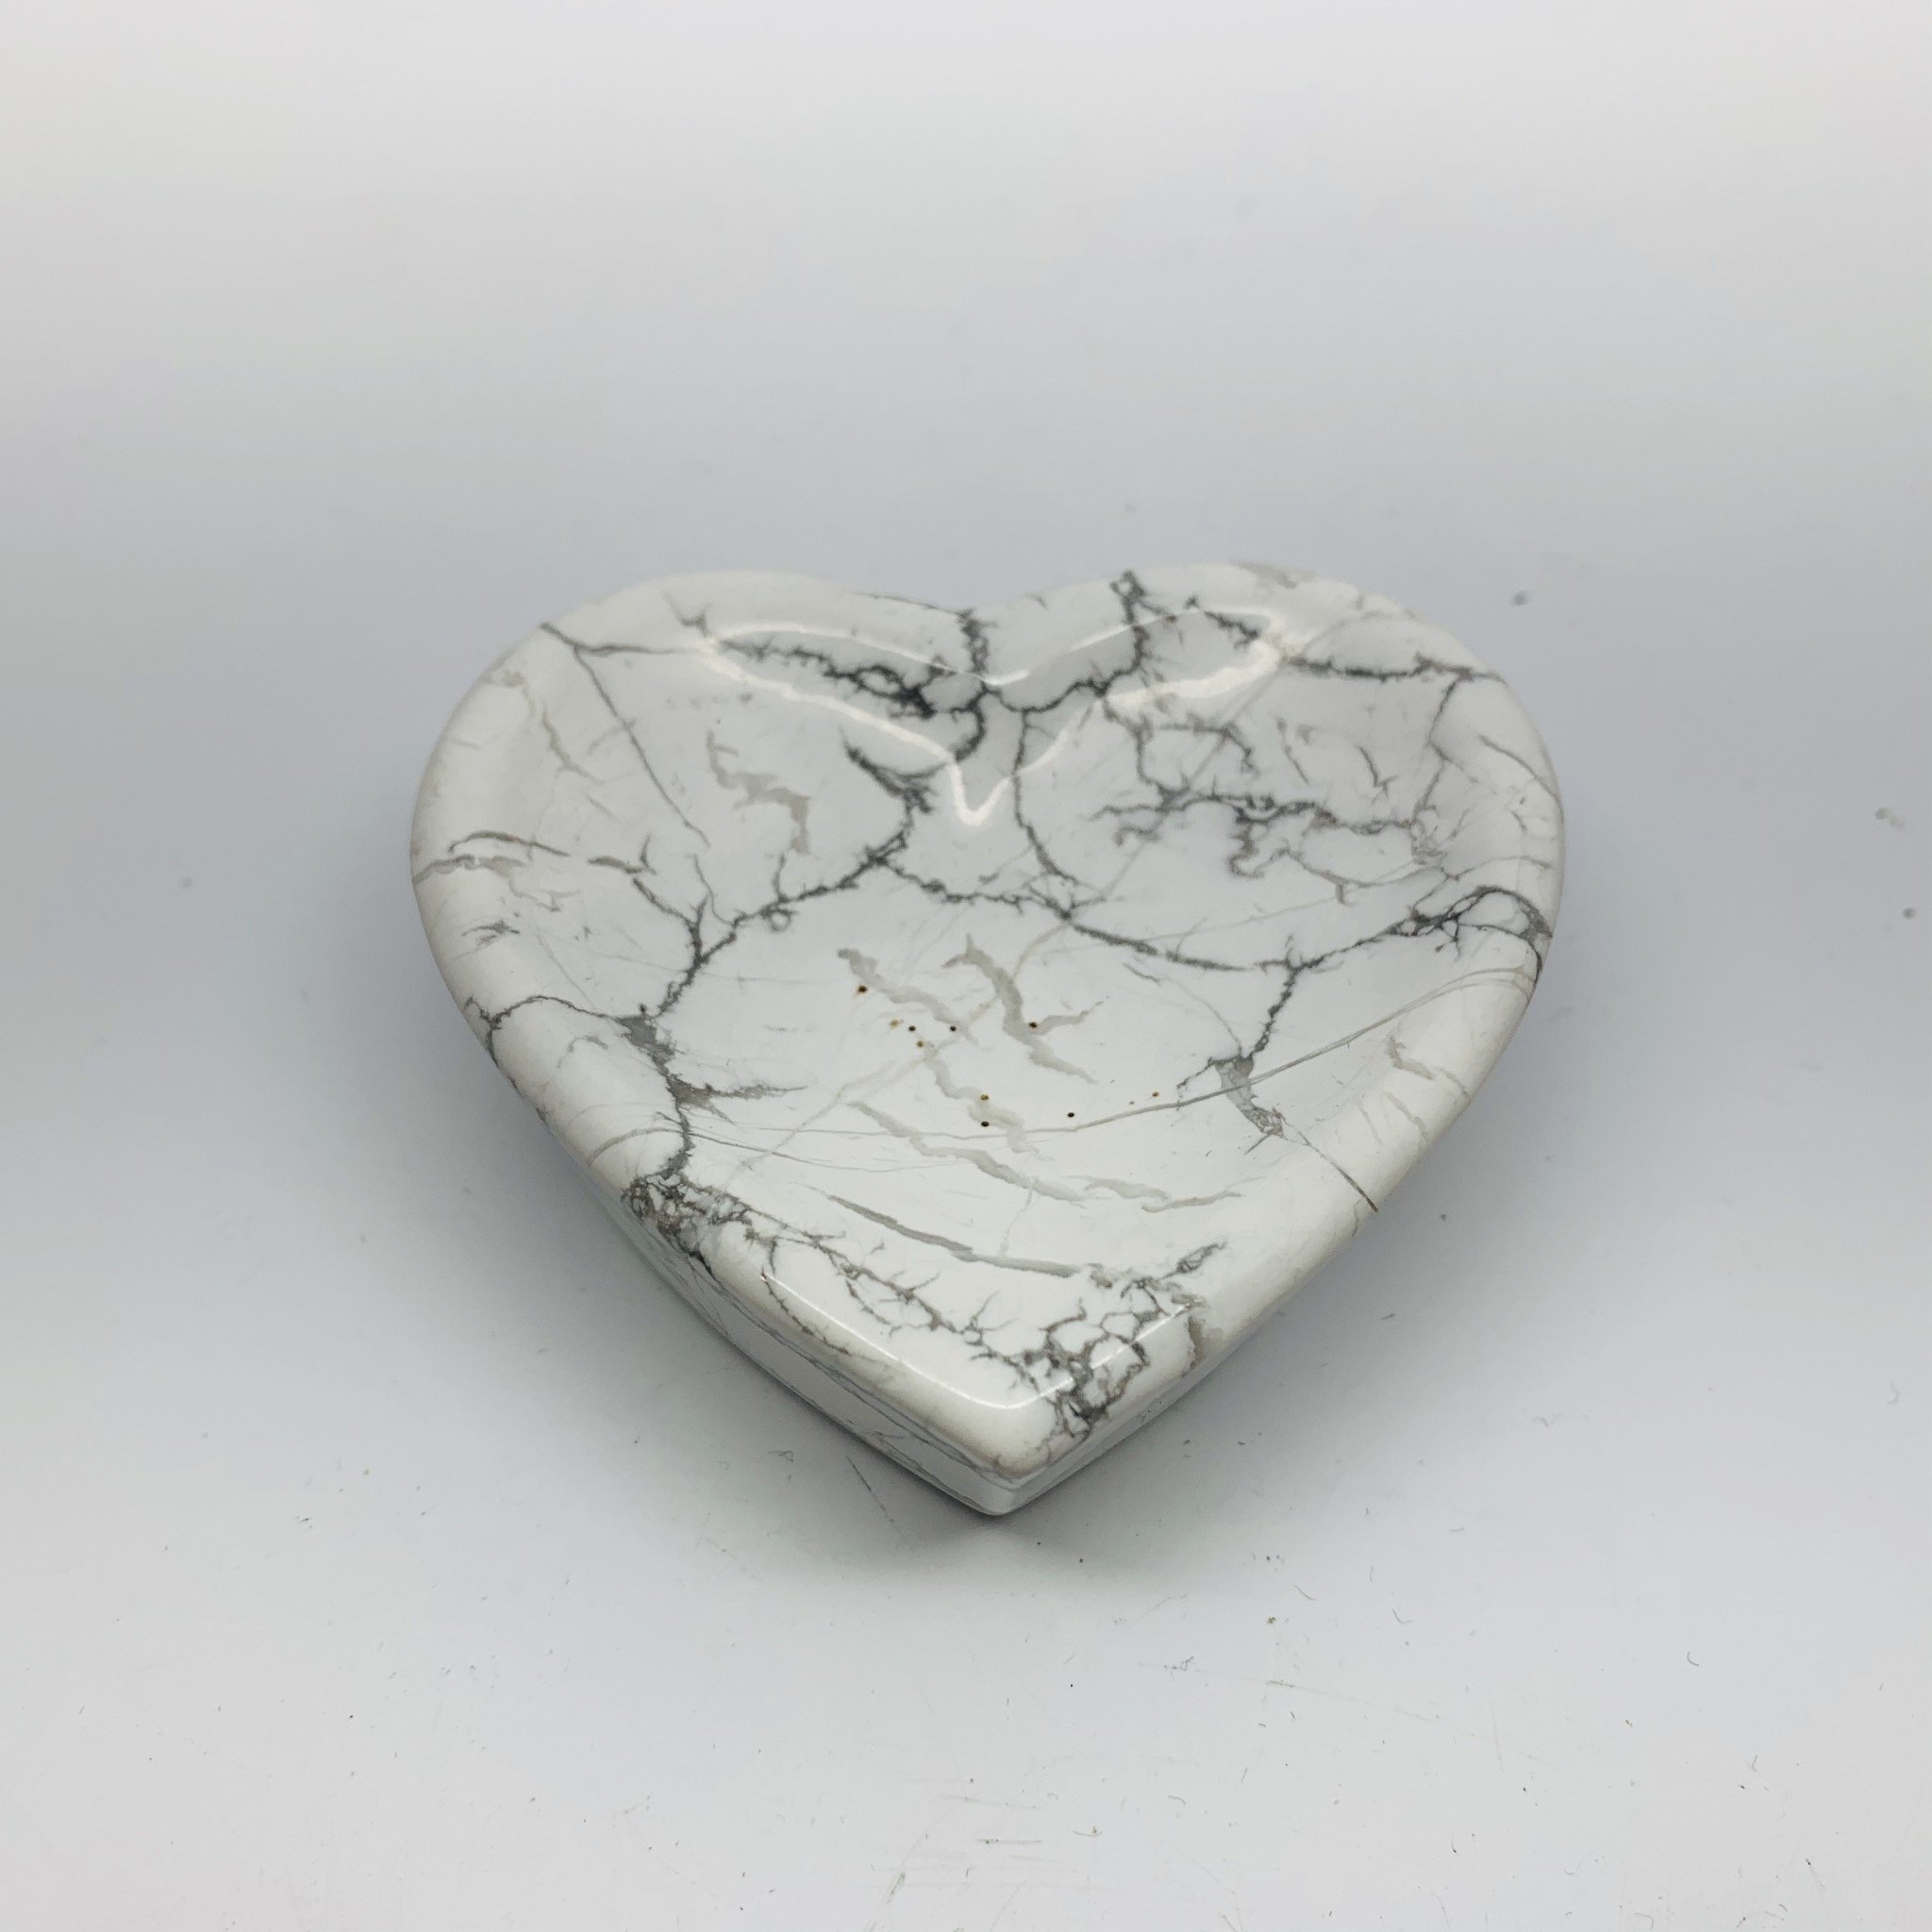 Heart Shaped Bowl | White Howlite-1